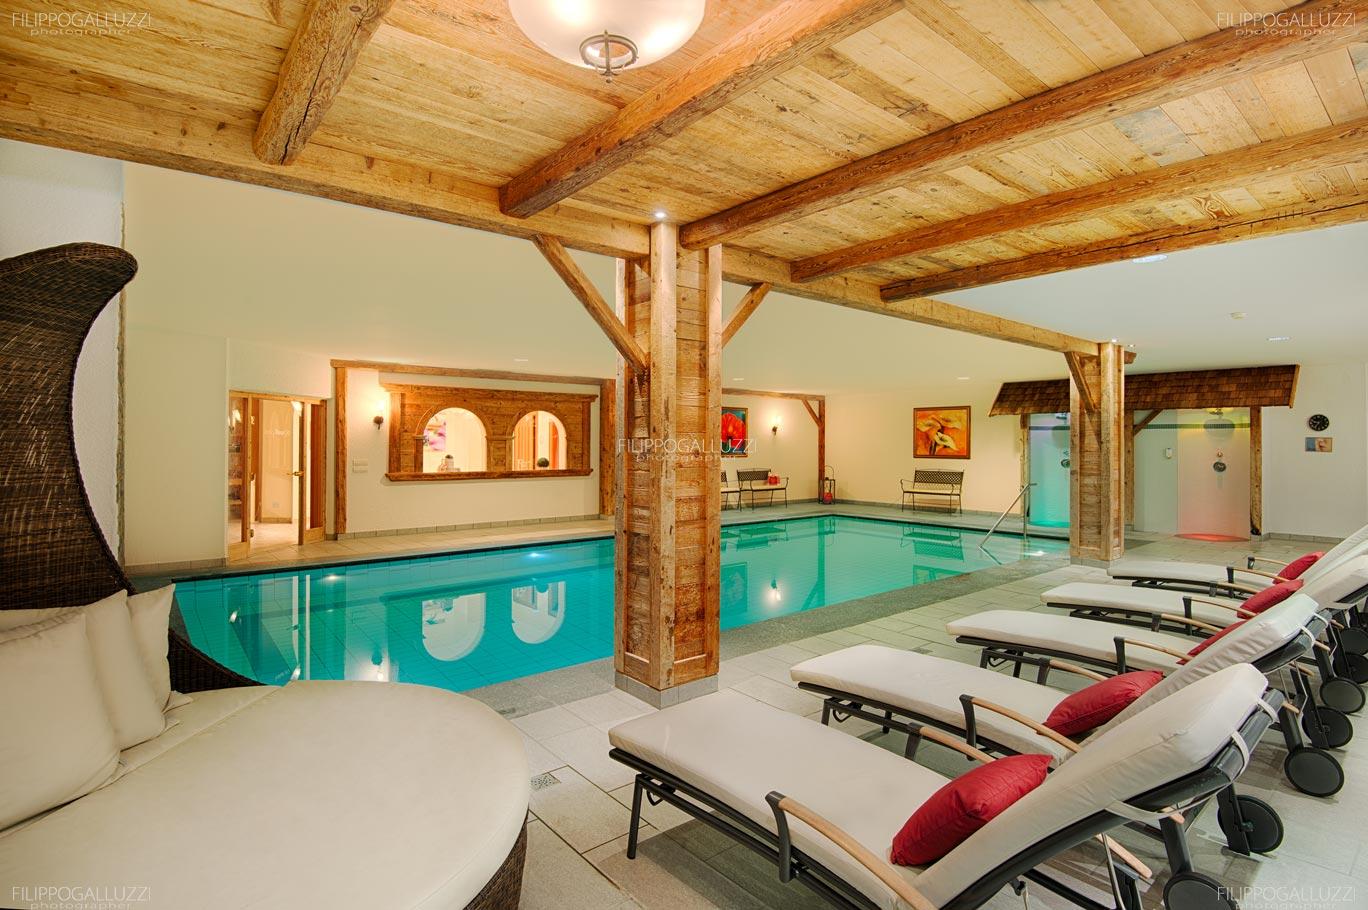 Valle Aurina, San Giovanni, Hotel Alpwell Gallhaus ****